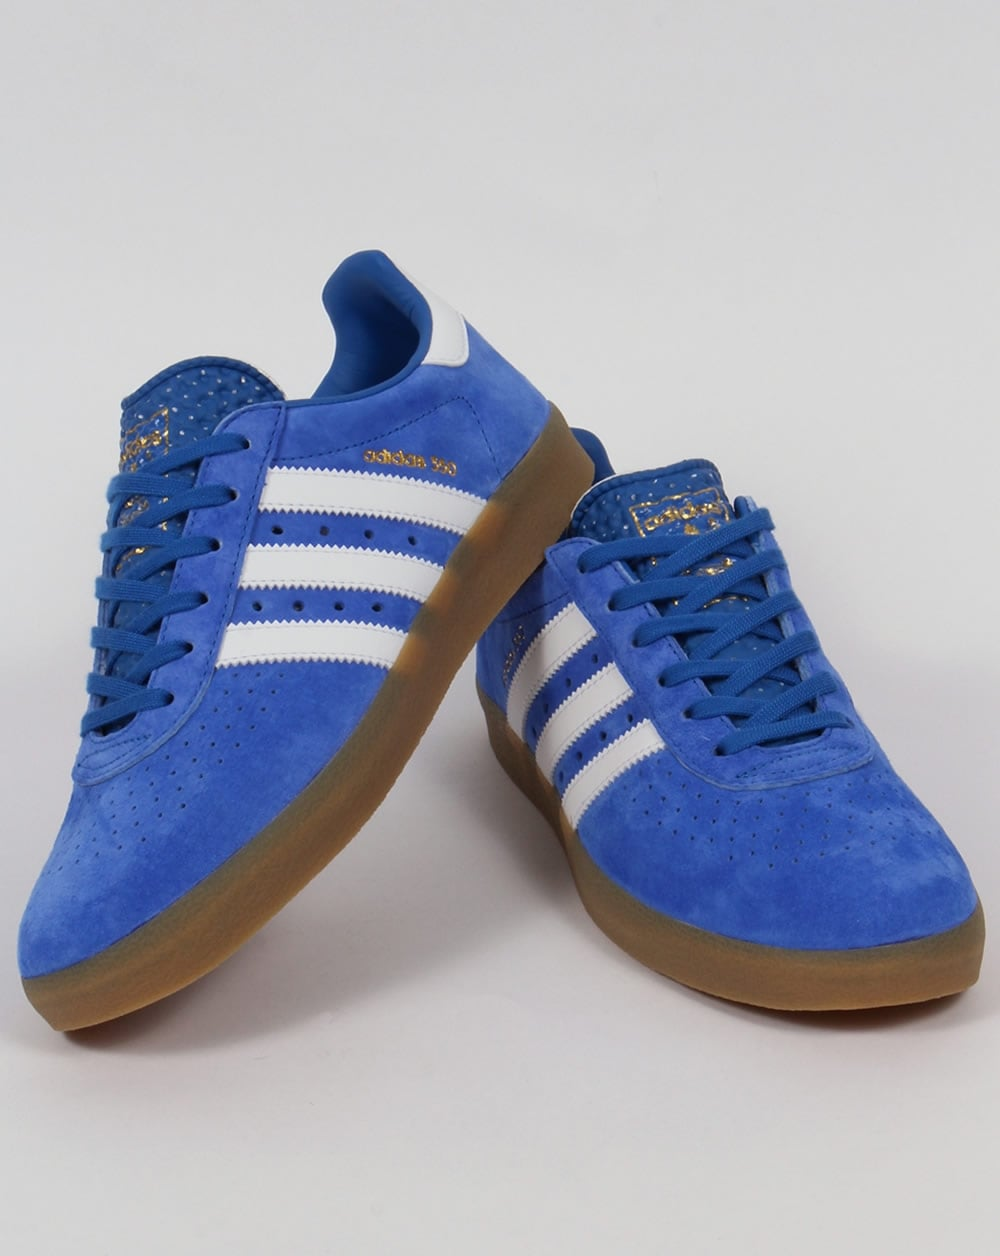 Adidas Trainers Adidas 350 Trainers Blue/White/Gum